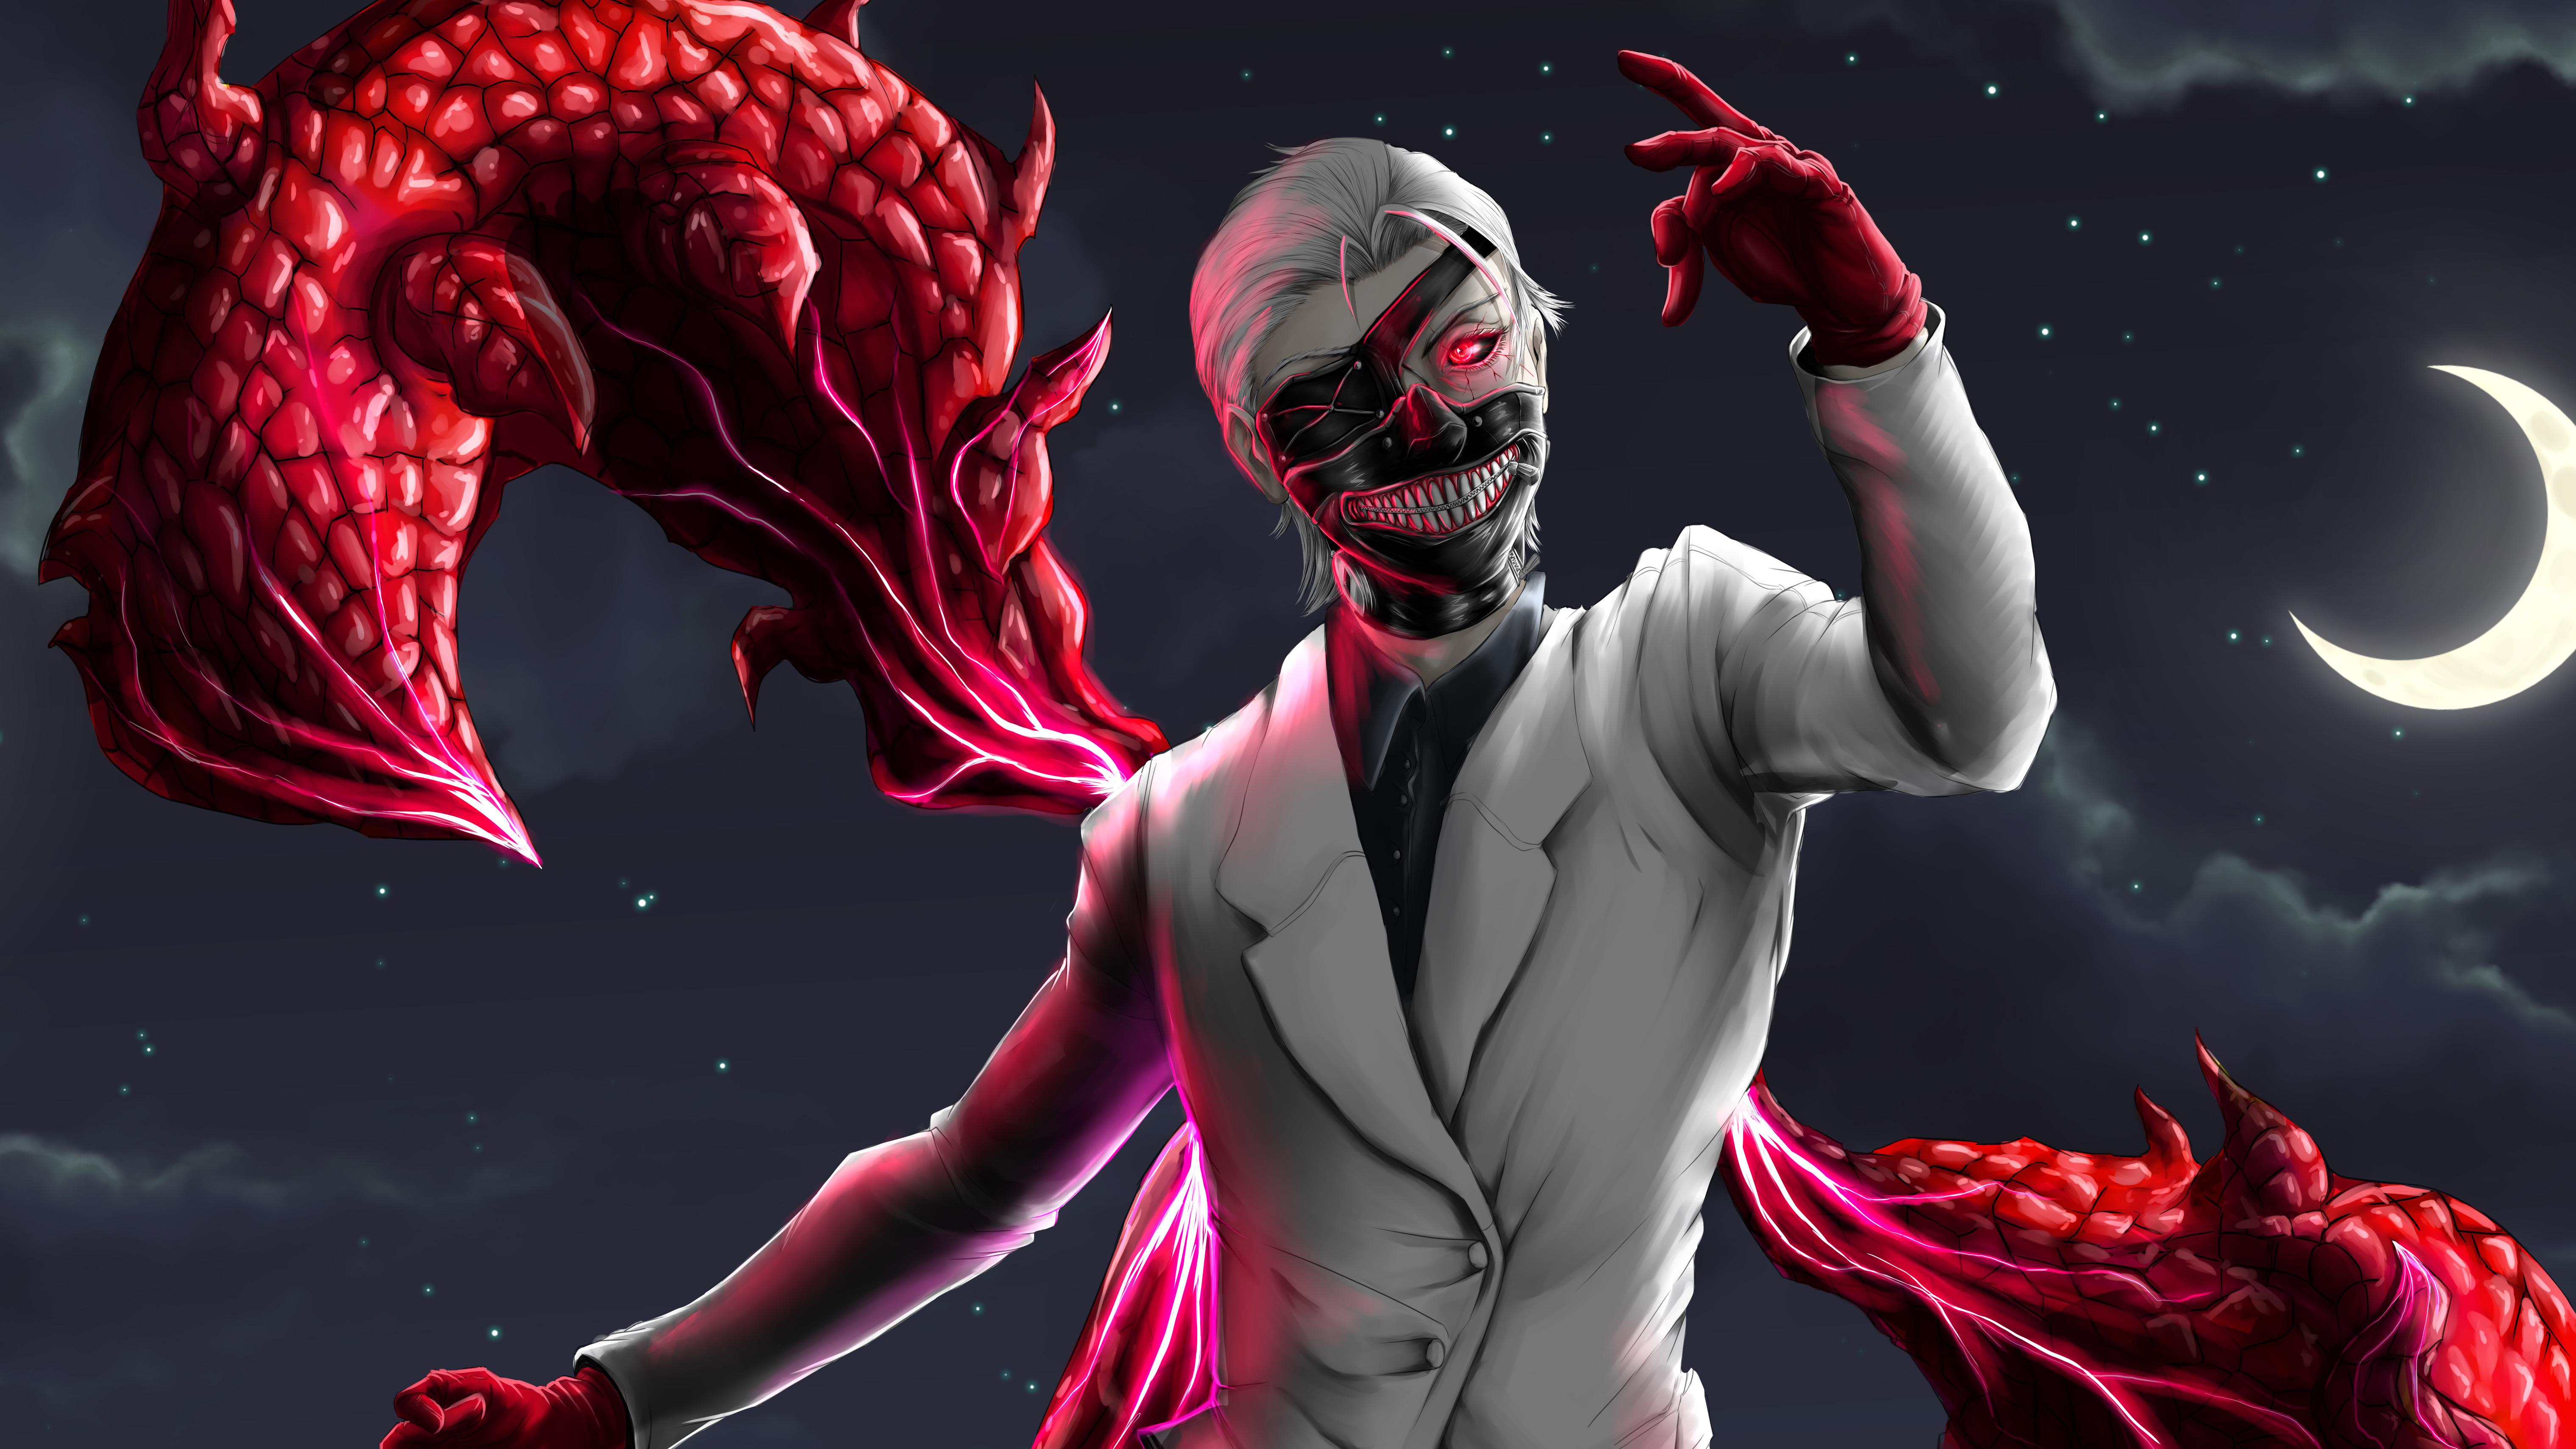 Tokyo Ghoul Desktop Wallpaper Posted By Christopher Peltier